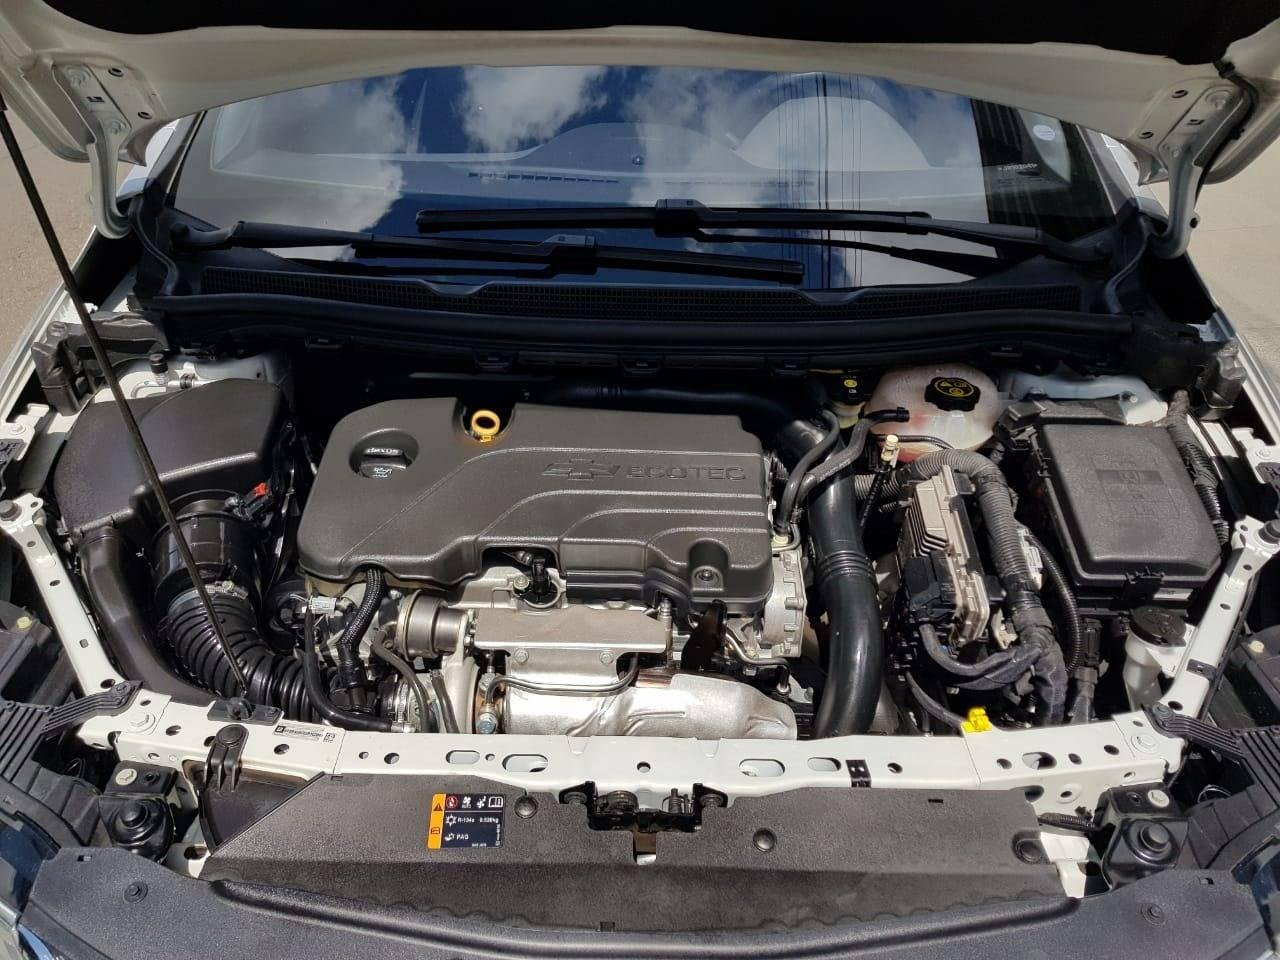 CHEVROLET Cruze Sedan 1.4 16V 4P LTZ FLEX TURBO AUTOMÁTICO, Foto 19